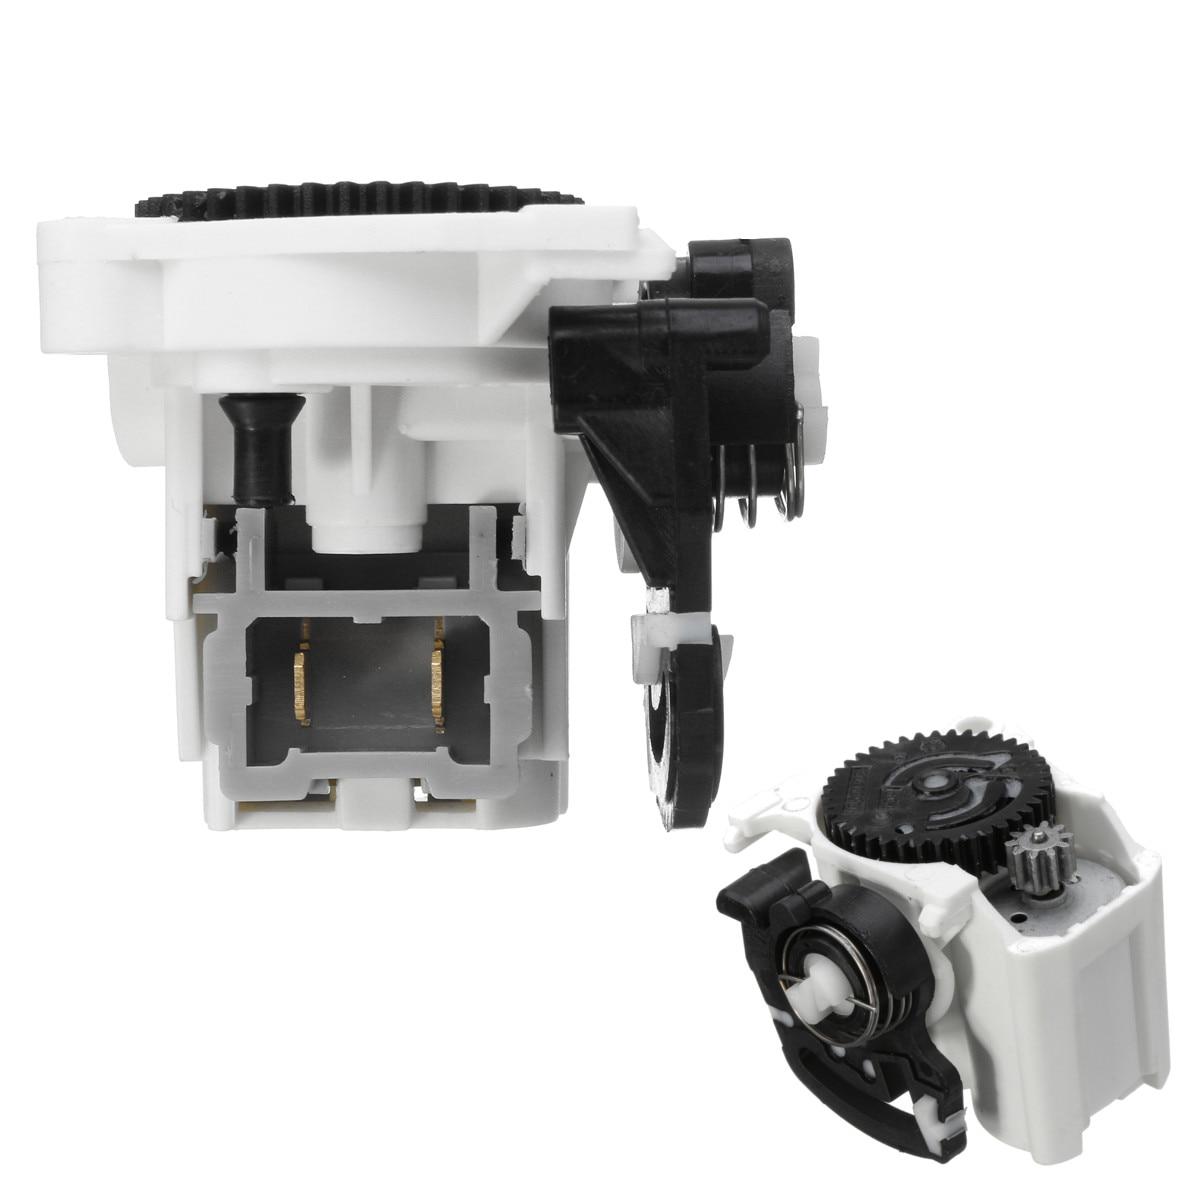 Kofferbak Centrale Vergrendeling Motor Voor Renault Clio 2 Megane Twingo Scenic 8200102583 7700435694 7701473742 N0501380